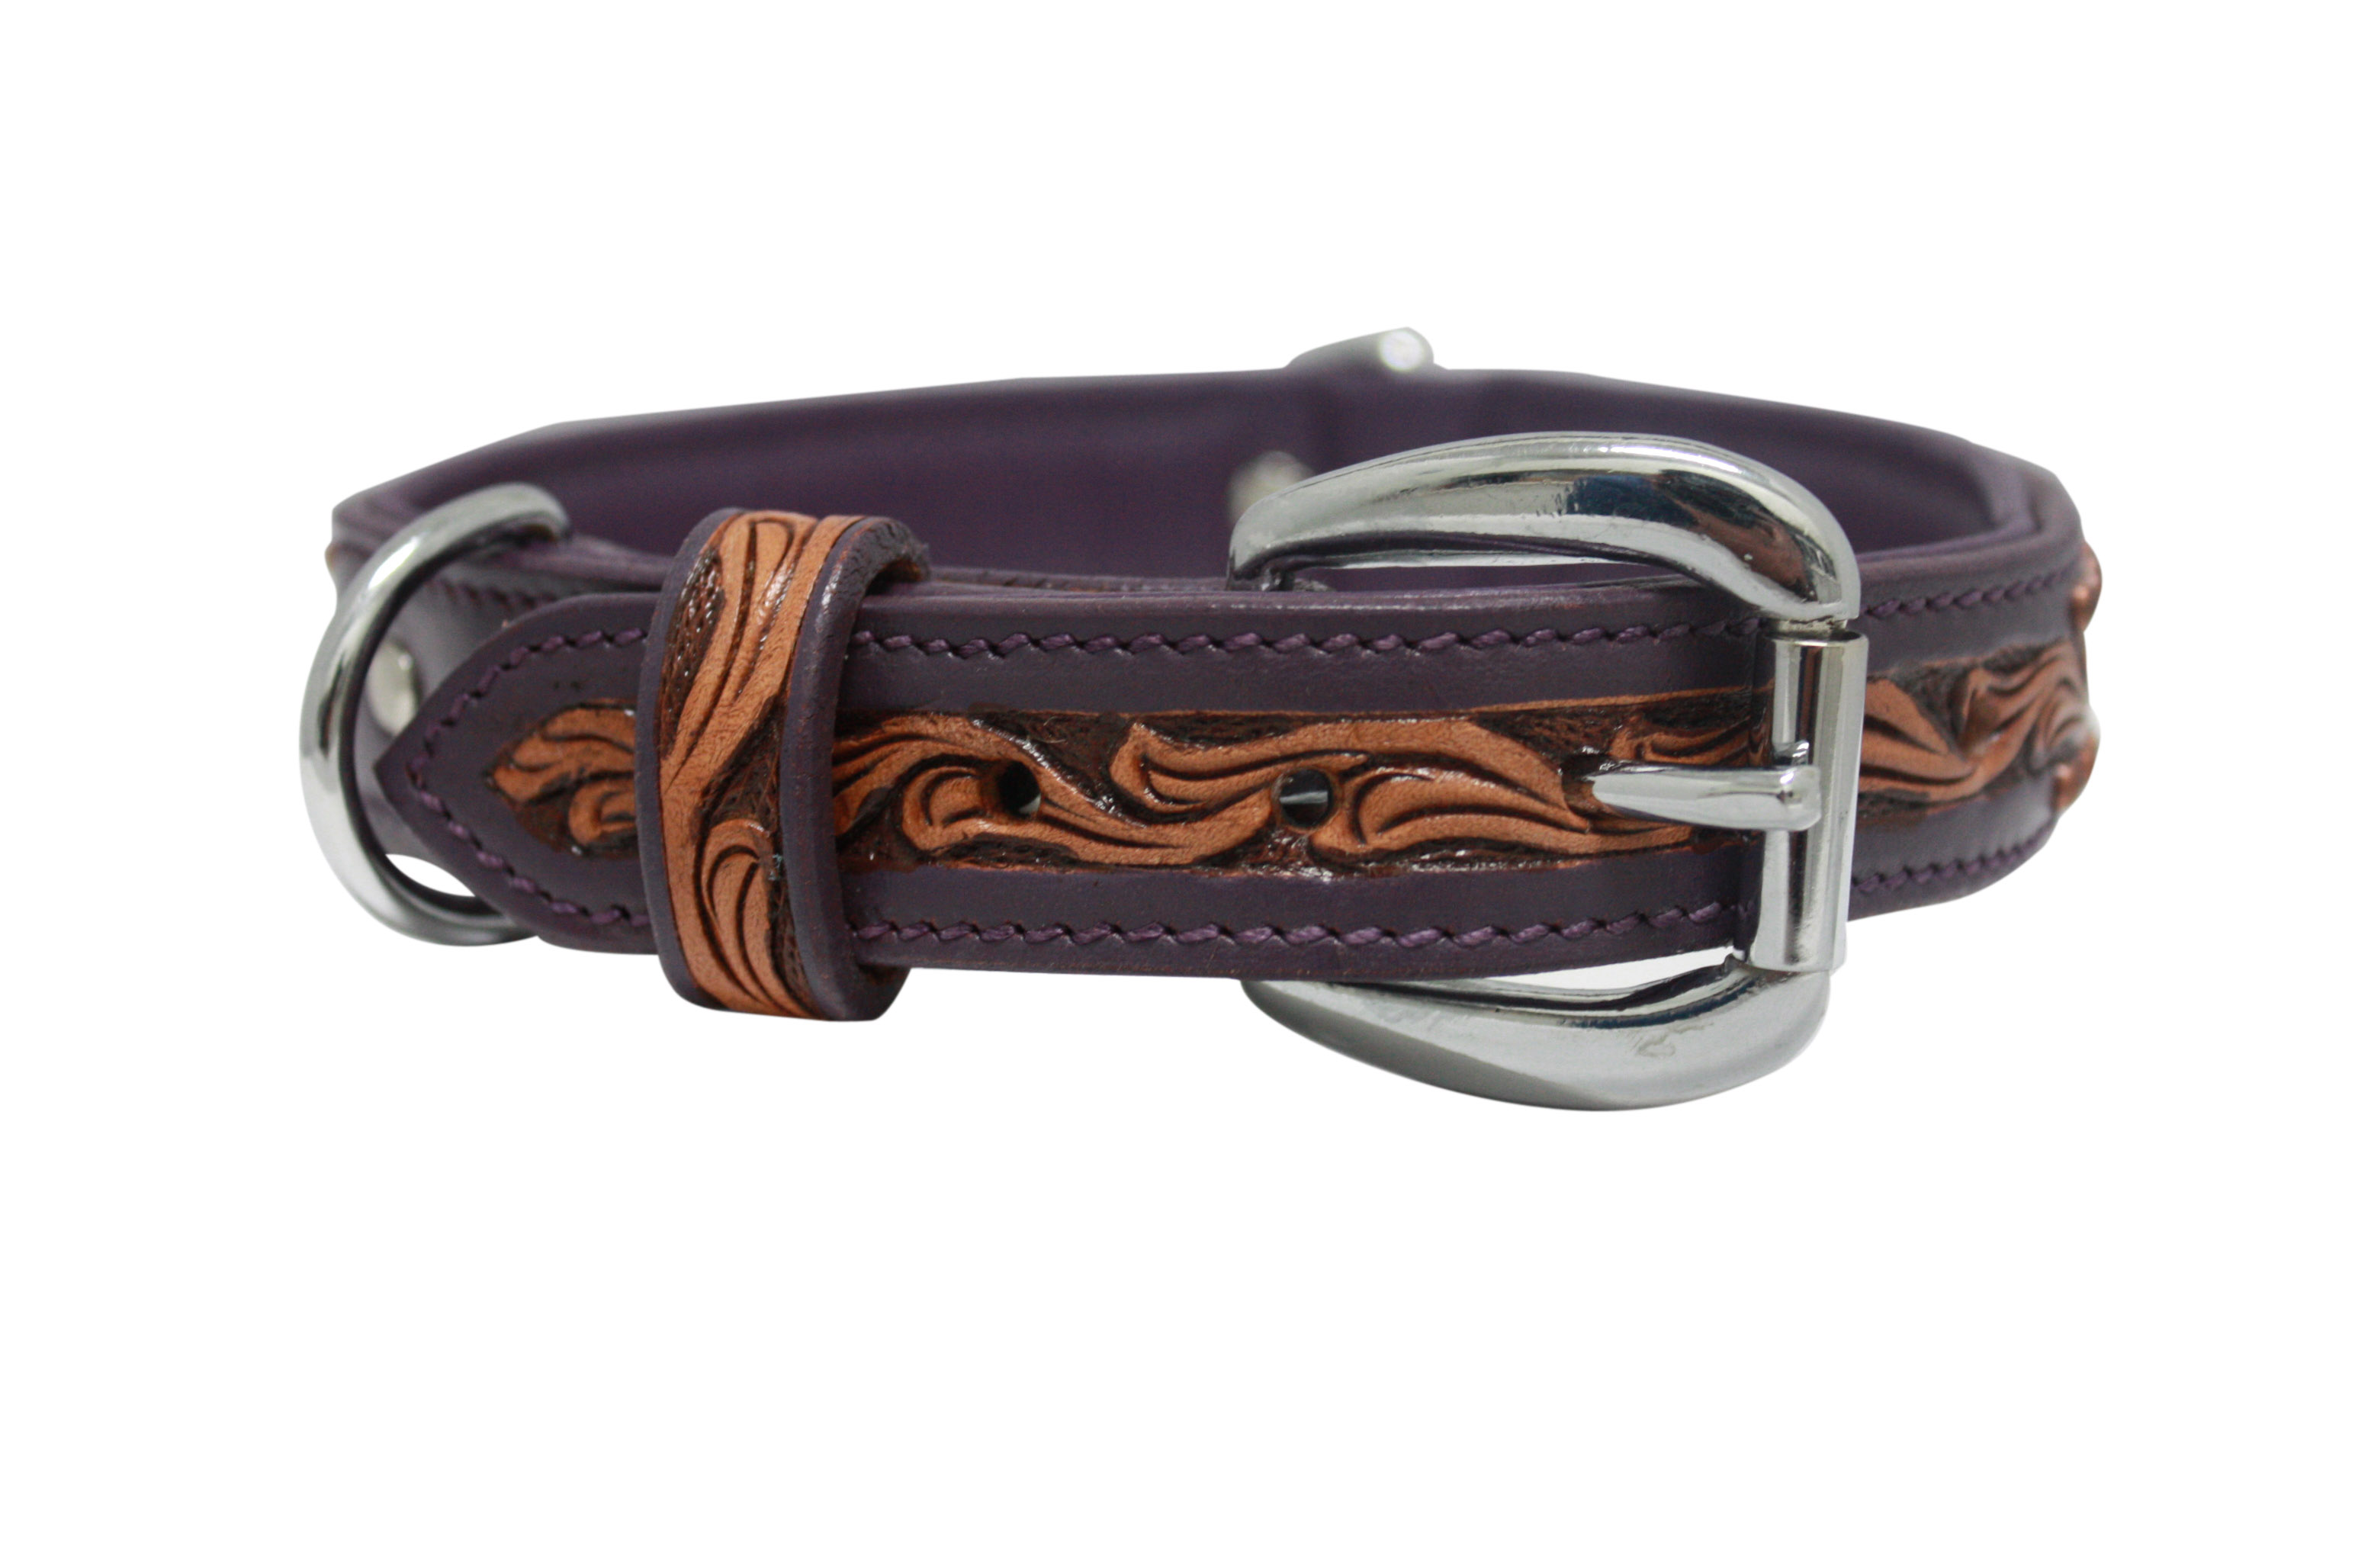 Hot Dog The San Antonio - Luxury Leather Dog Collar